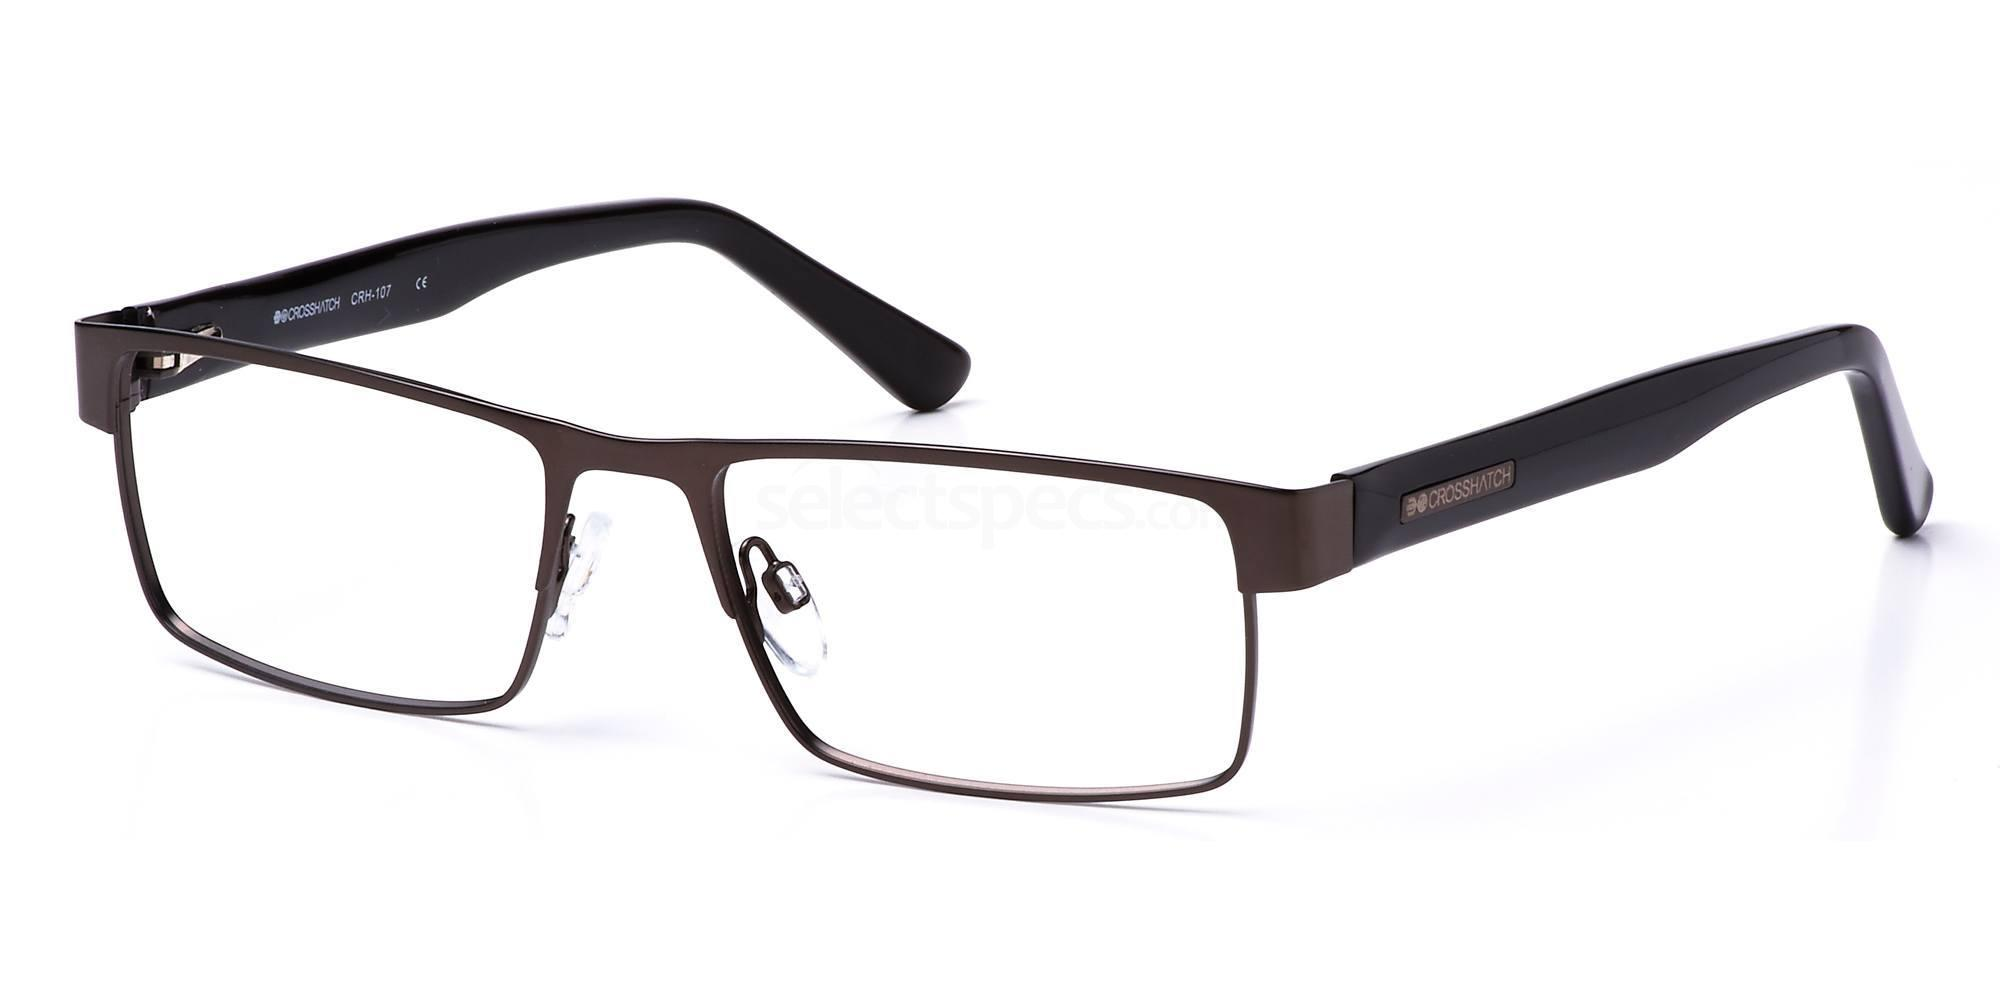 C1 CRH107 Glasses, Crosshatch